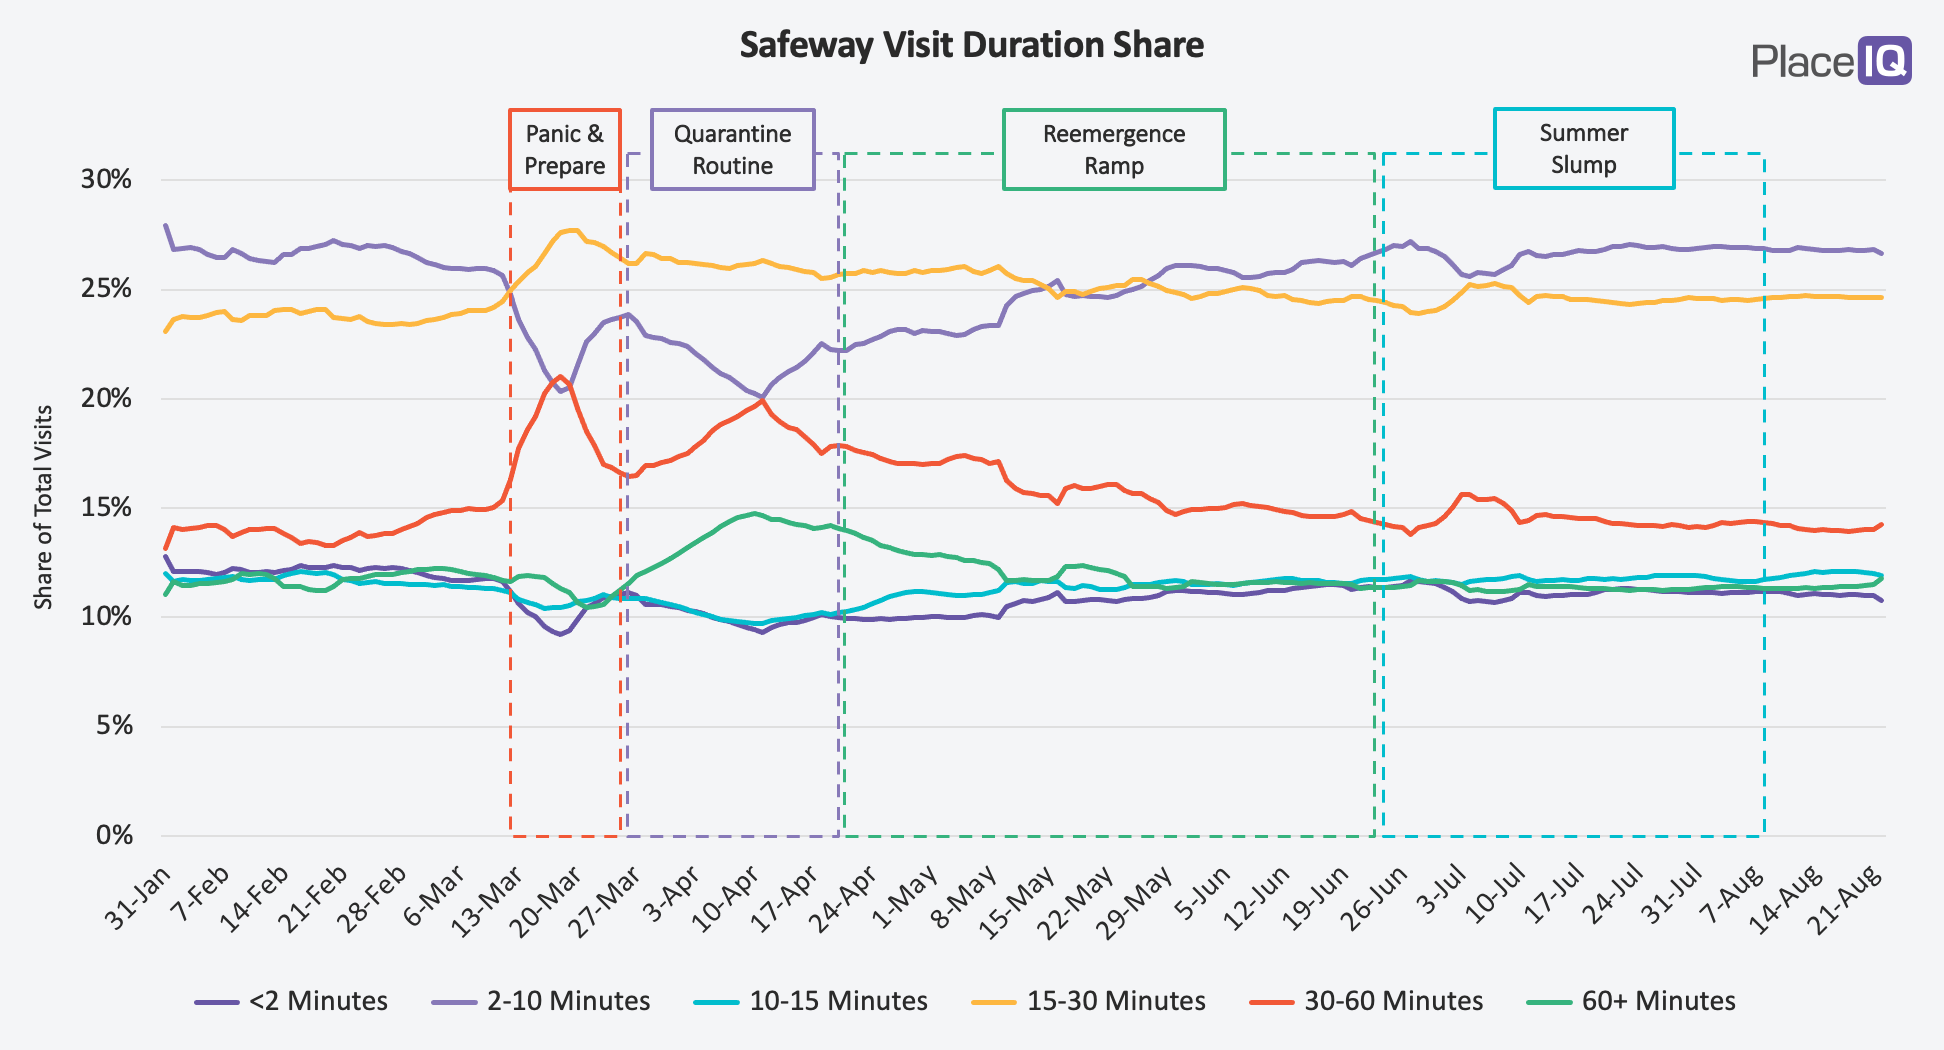 CHART: Safeway Visit Duration Share